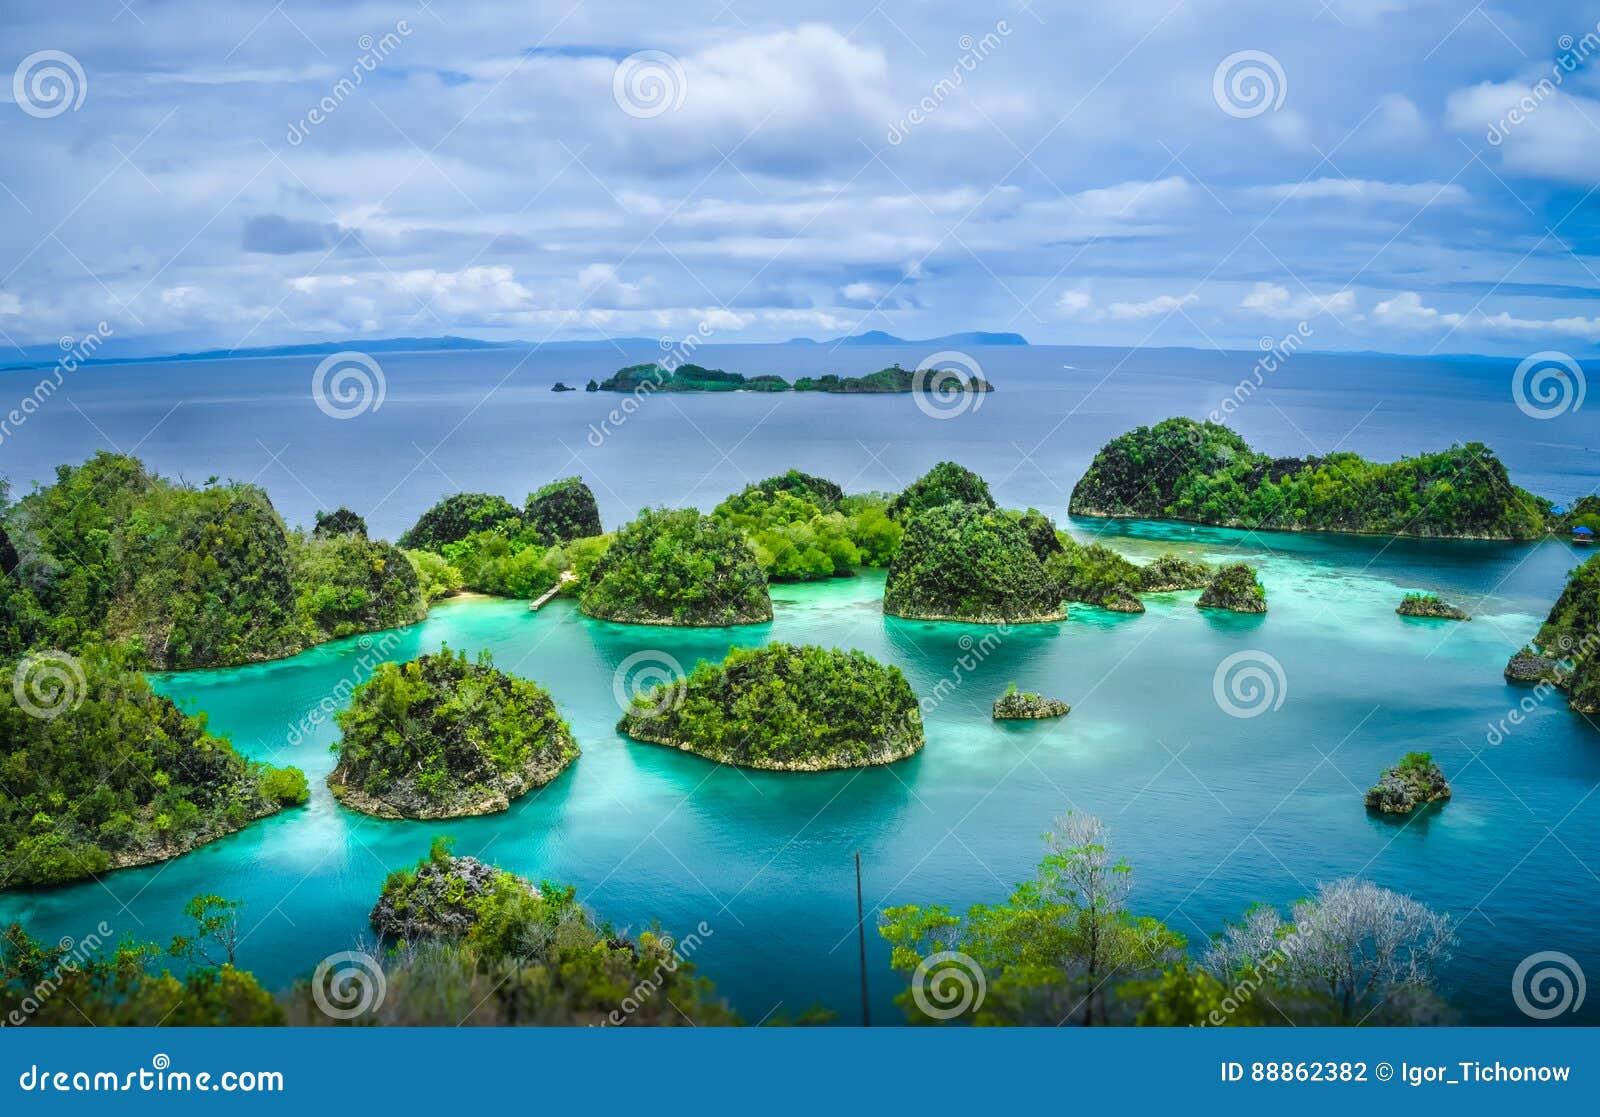 Острова Pianemo, раджа Ampat, западная Папуа, Индонезия